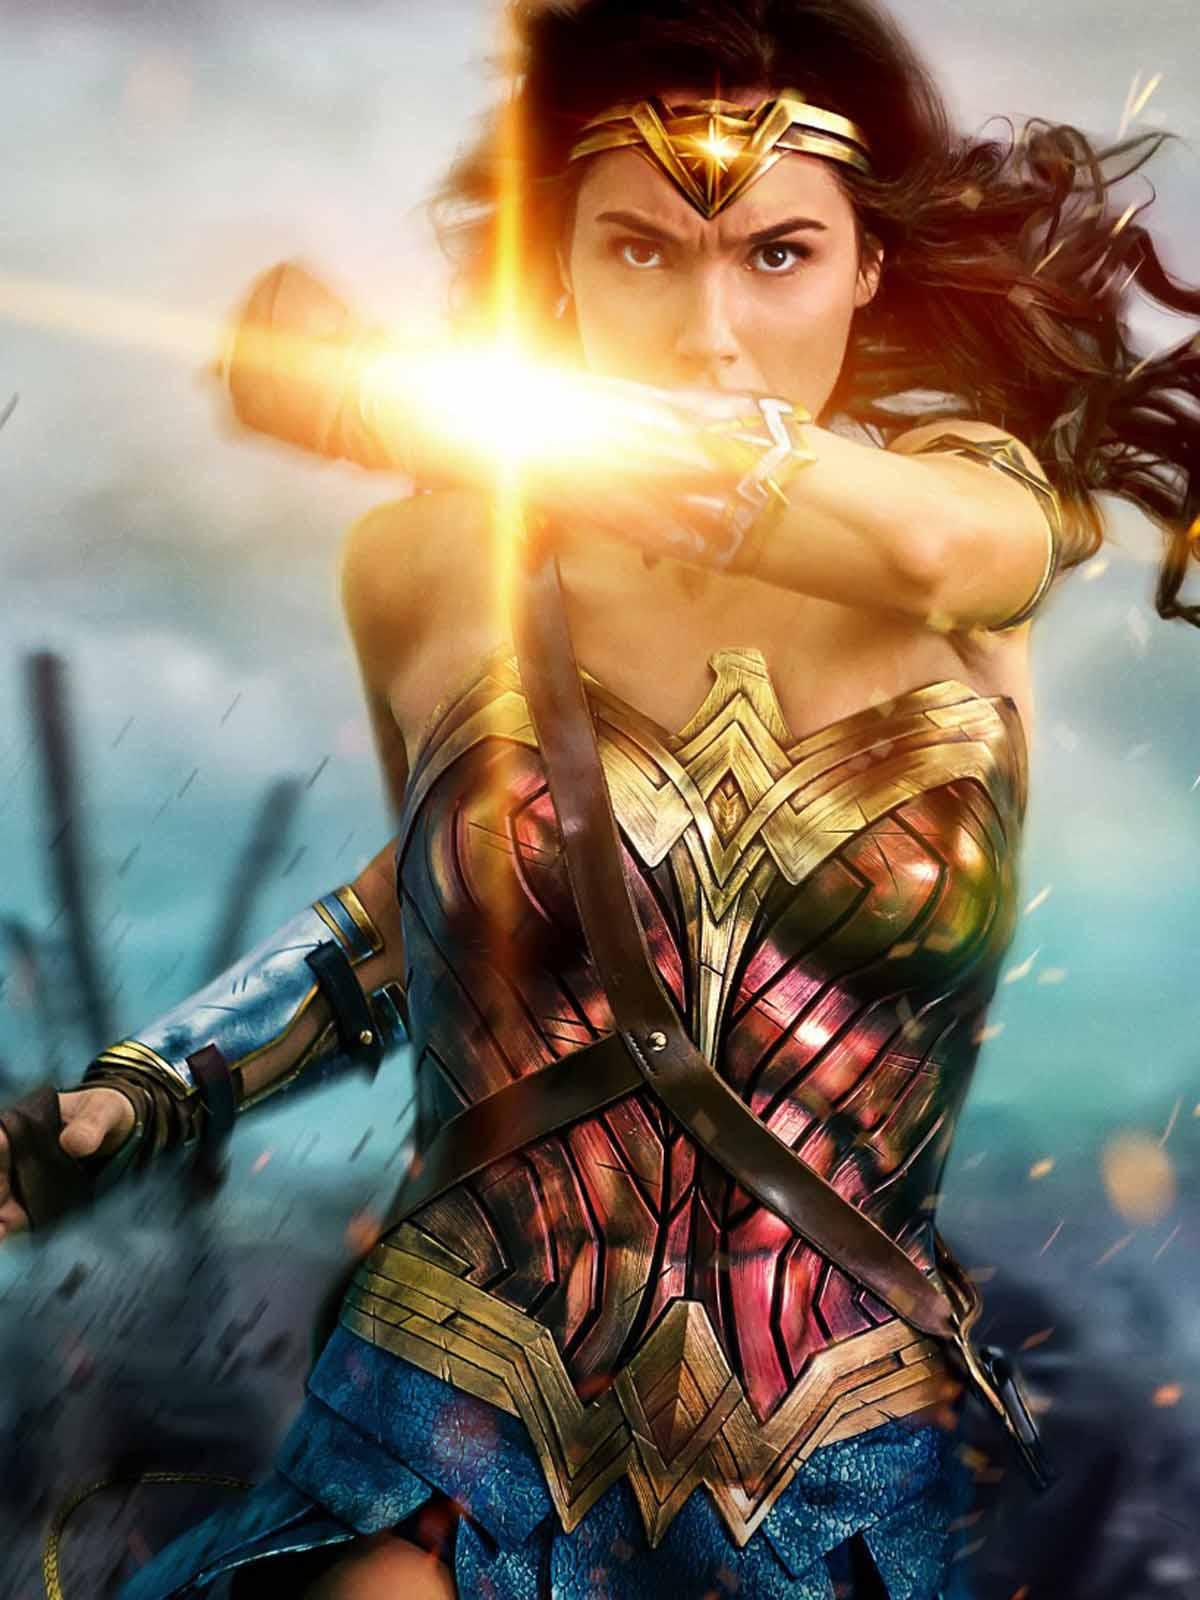 Download Wonder Woman Hd 2017 Free Pure 4k Ultra Hd Mobile Wallpaper